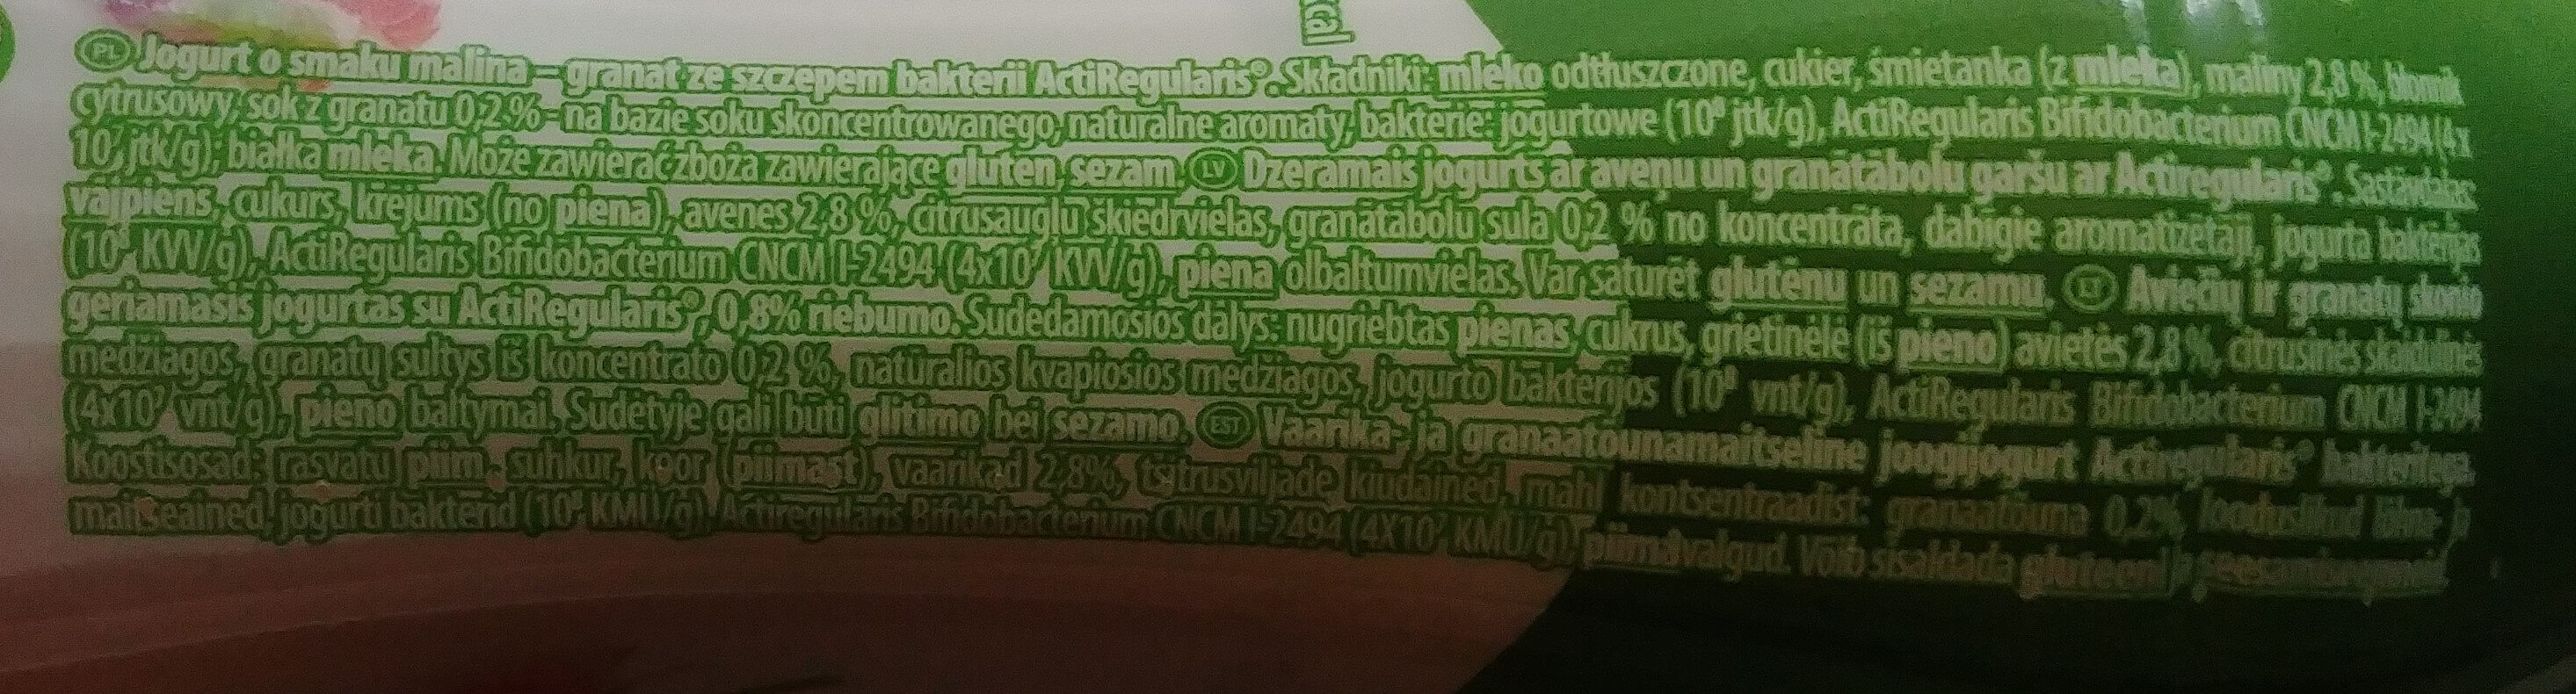 Jogurt o smaku malina-granat ze szczepem bakterii ActiRegularis - Składniki